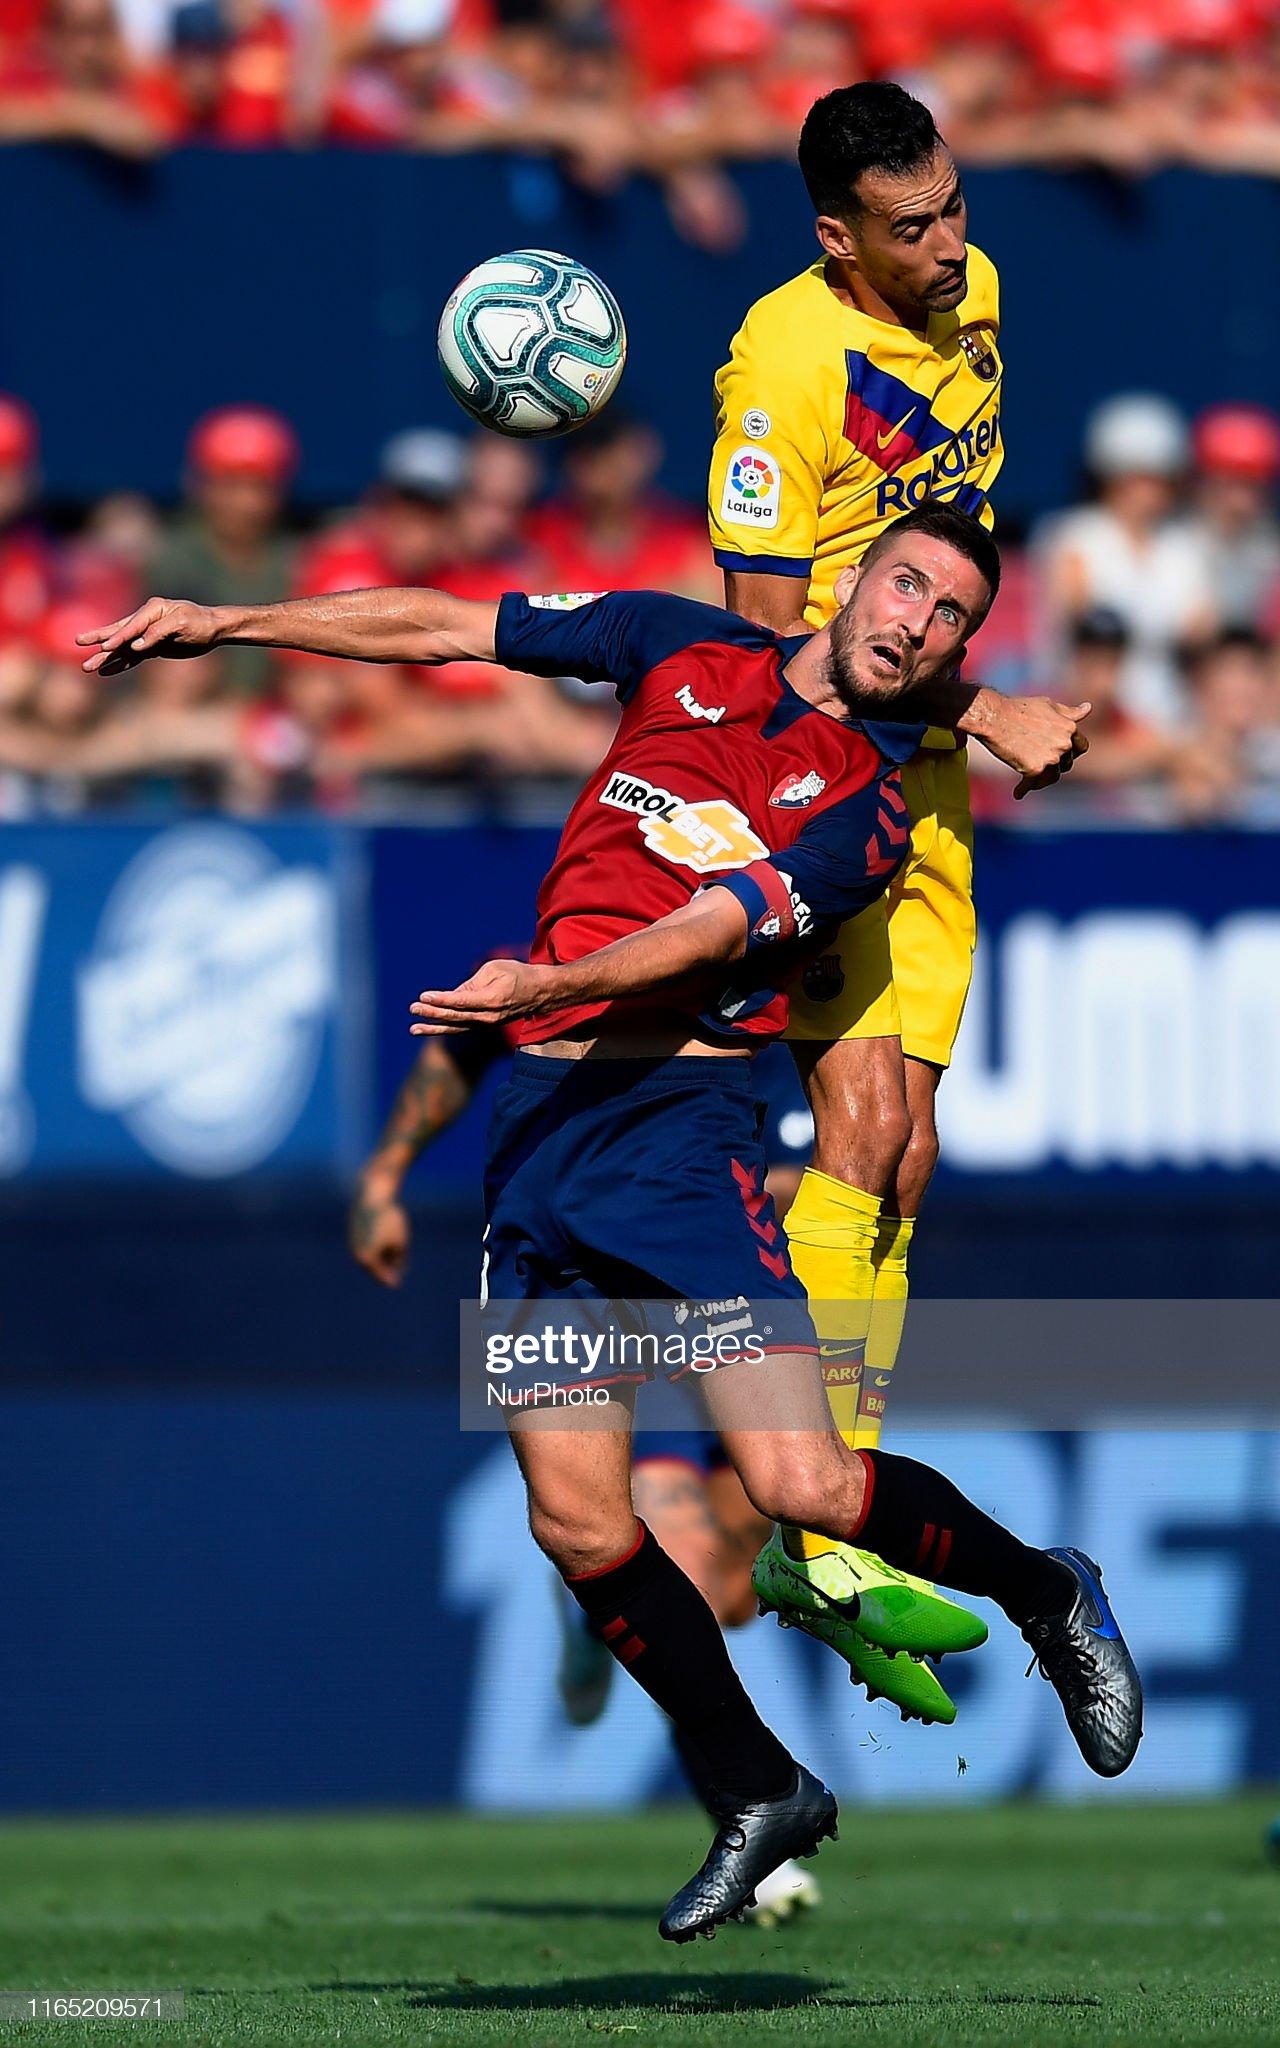 صور مباراة : أوساسونا - برشلونة 2-2 ( 31-08-2019 )  Oier-of-osasuna-and-sergio-busquets-of-barcelona-competes-for-the-picture-id1165209571?s=2048x2048